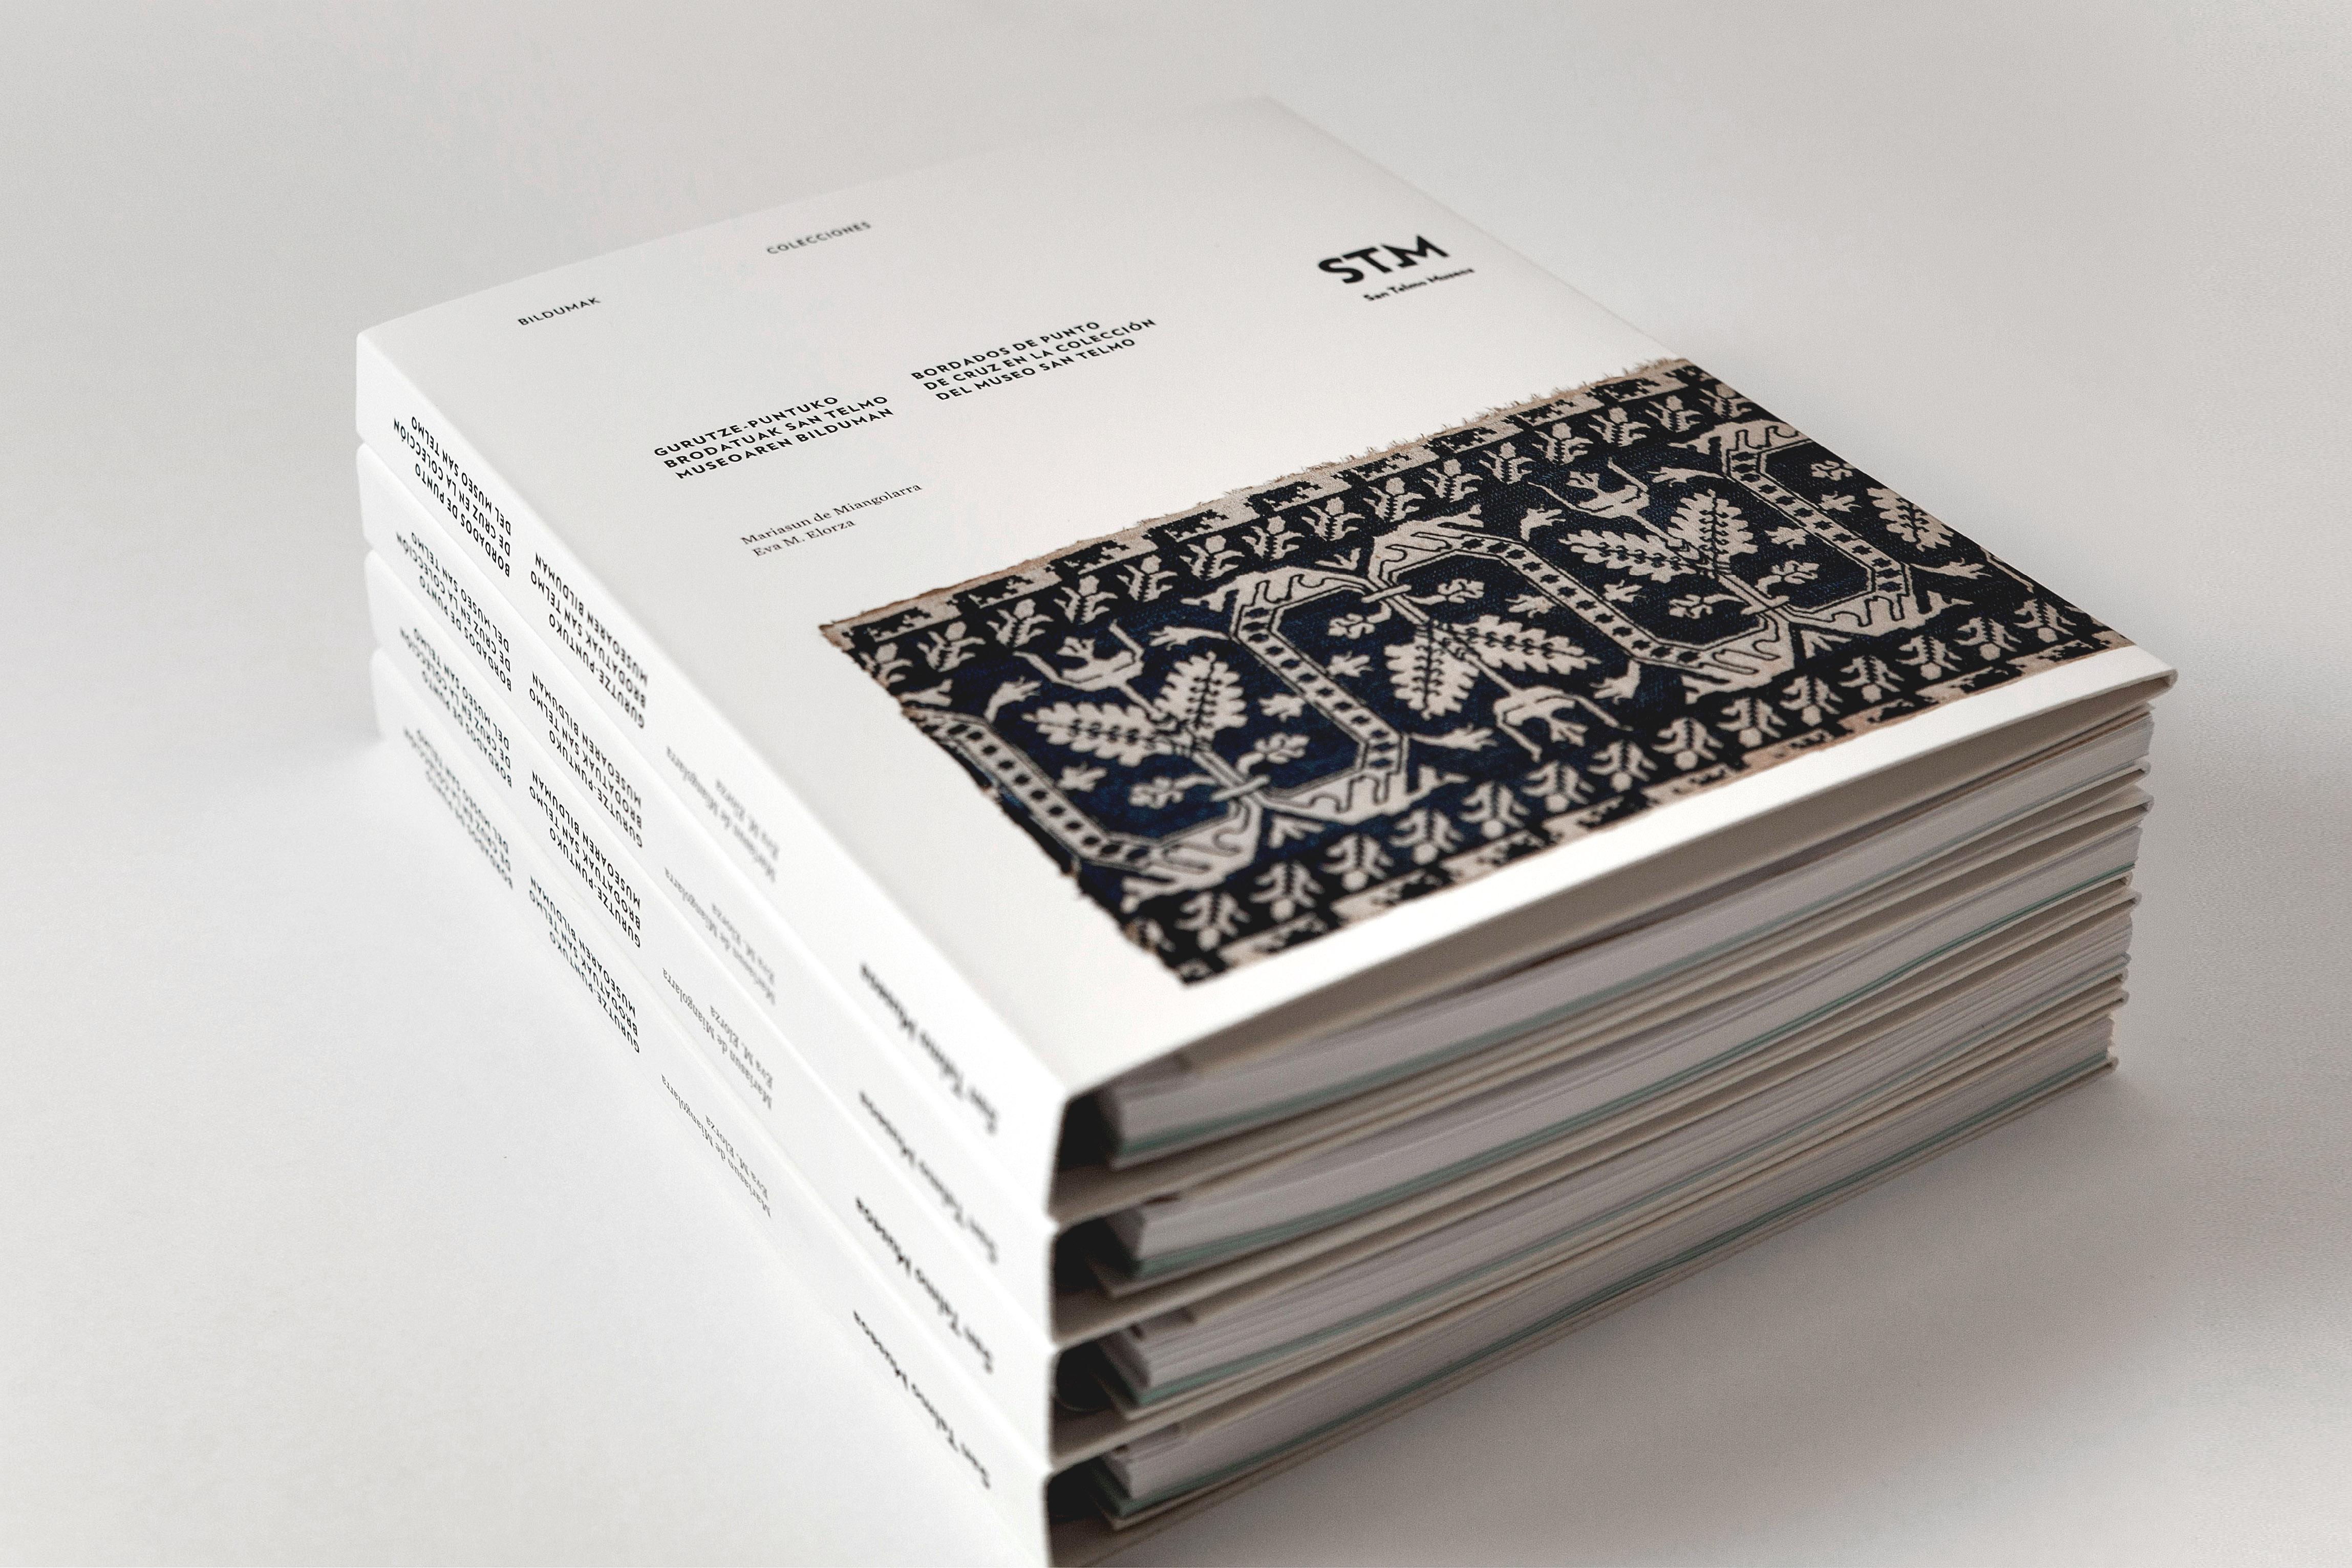 Bordados - Diseño editorial para STM by Strogoff Komunikazioa - Creative Work